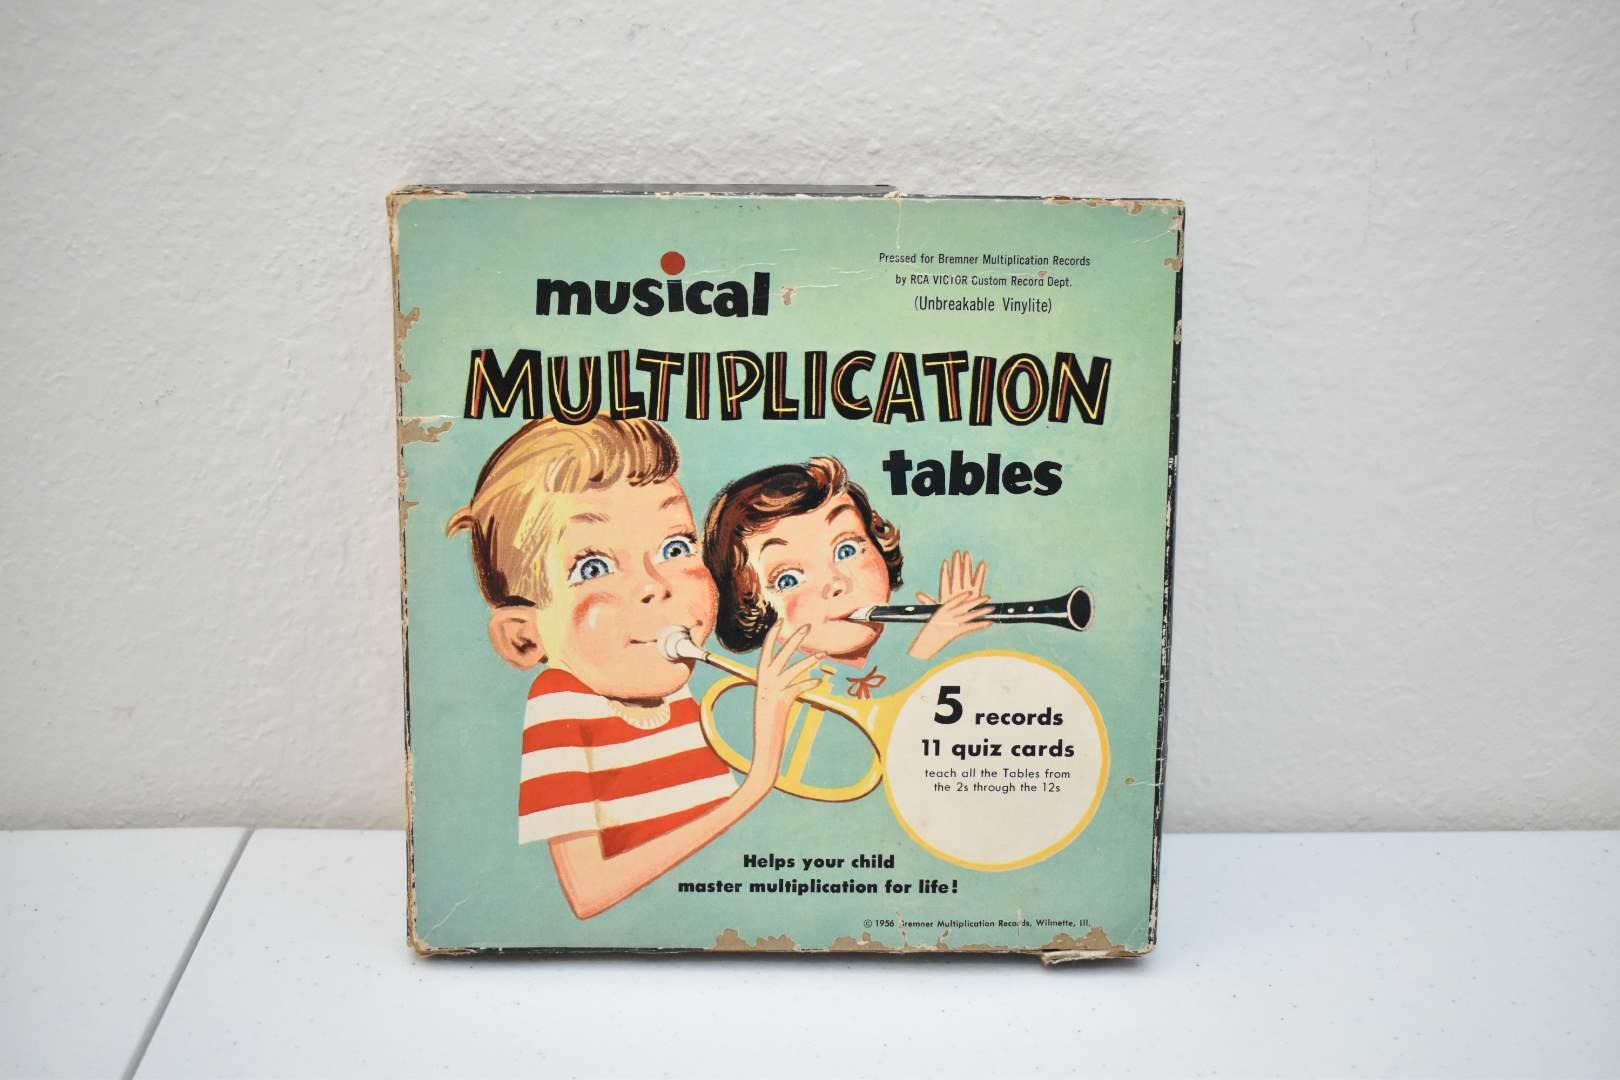 Vinyl from 1956: Musical Multiplication Tables